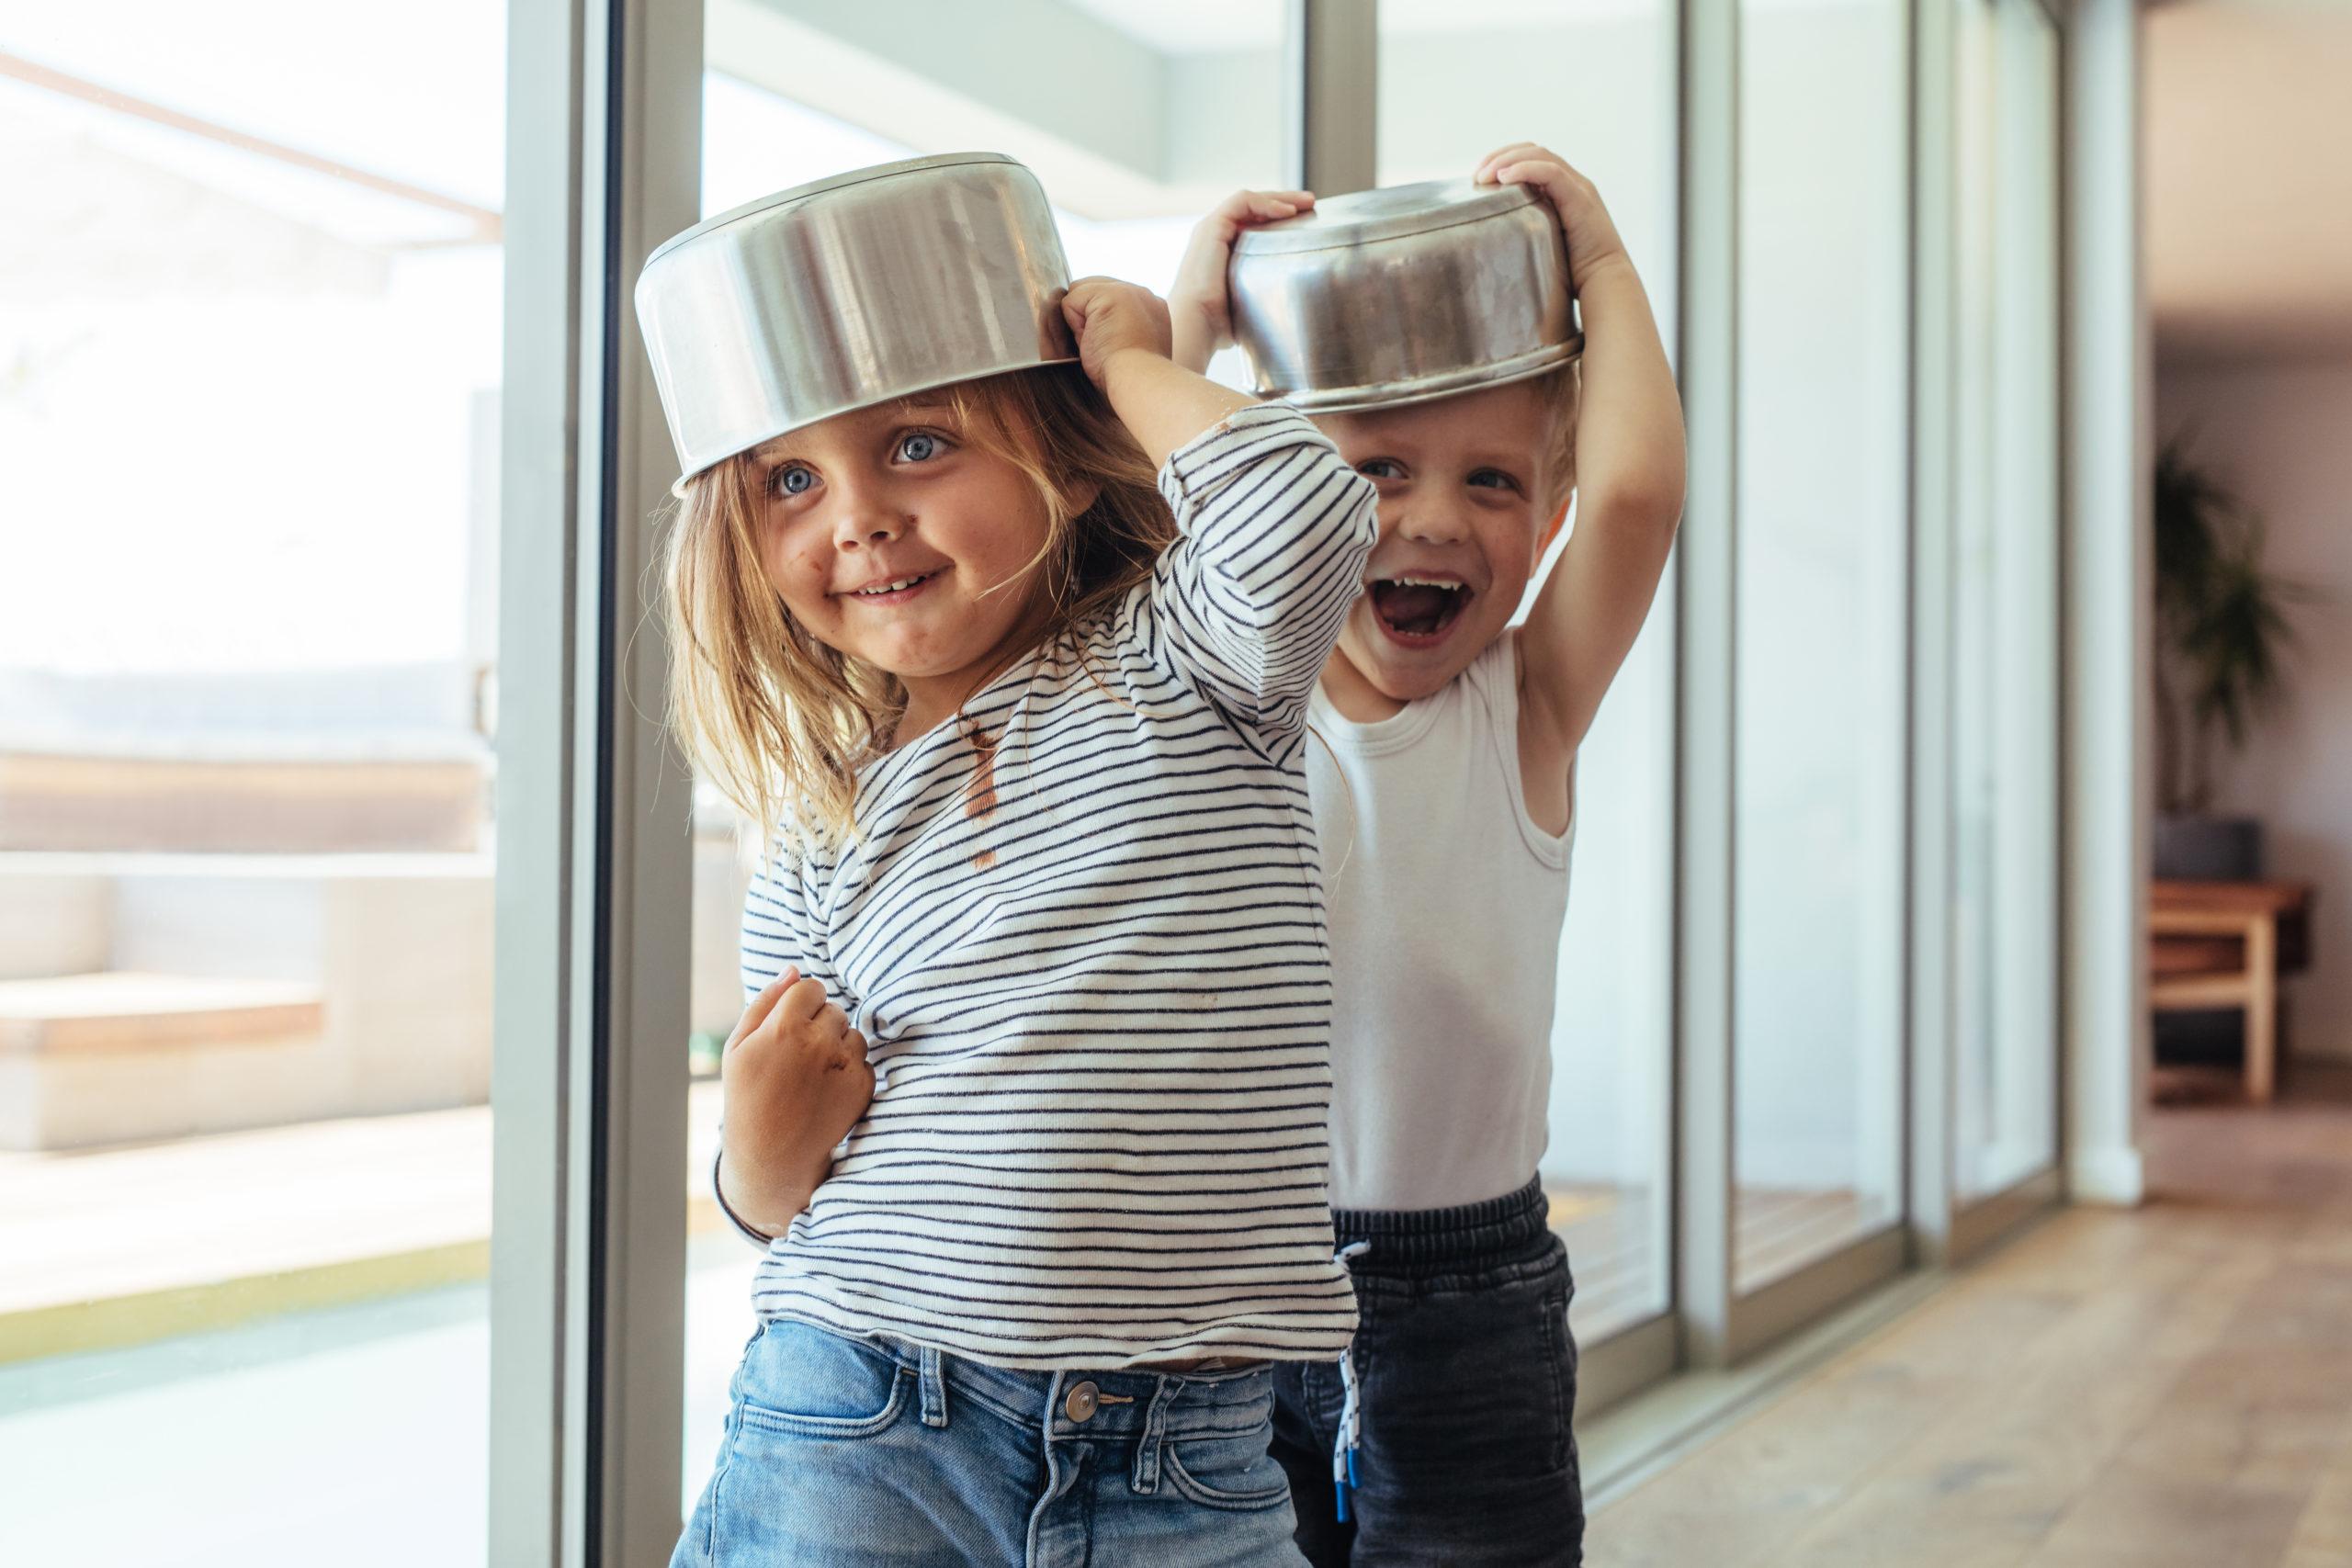 Erziehungsberatung - Spielende Kinder